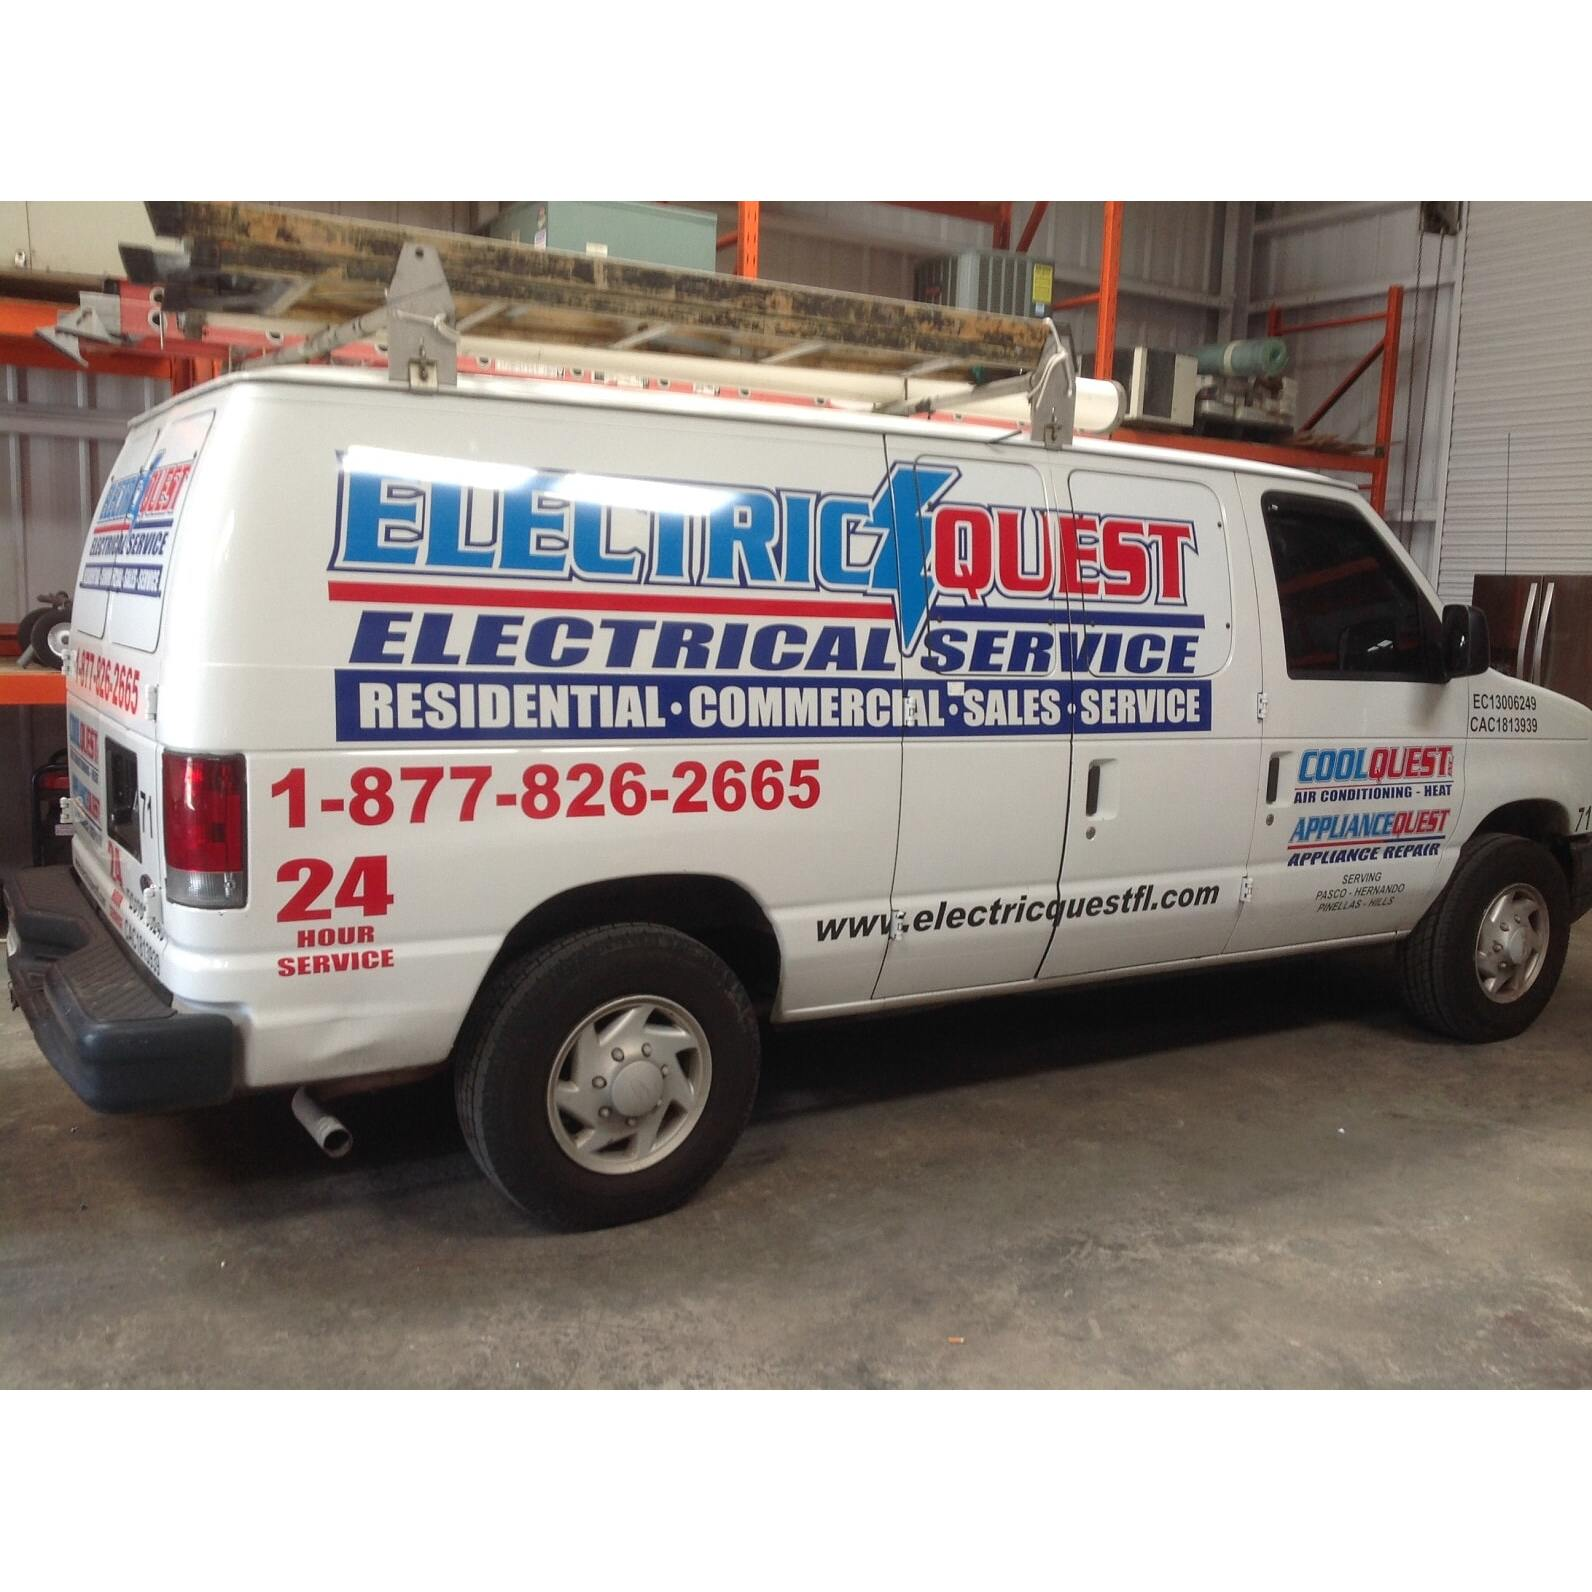 ElectricQuest